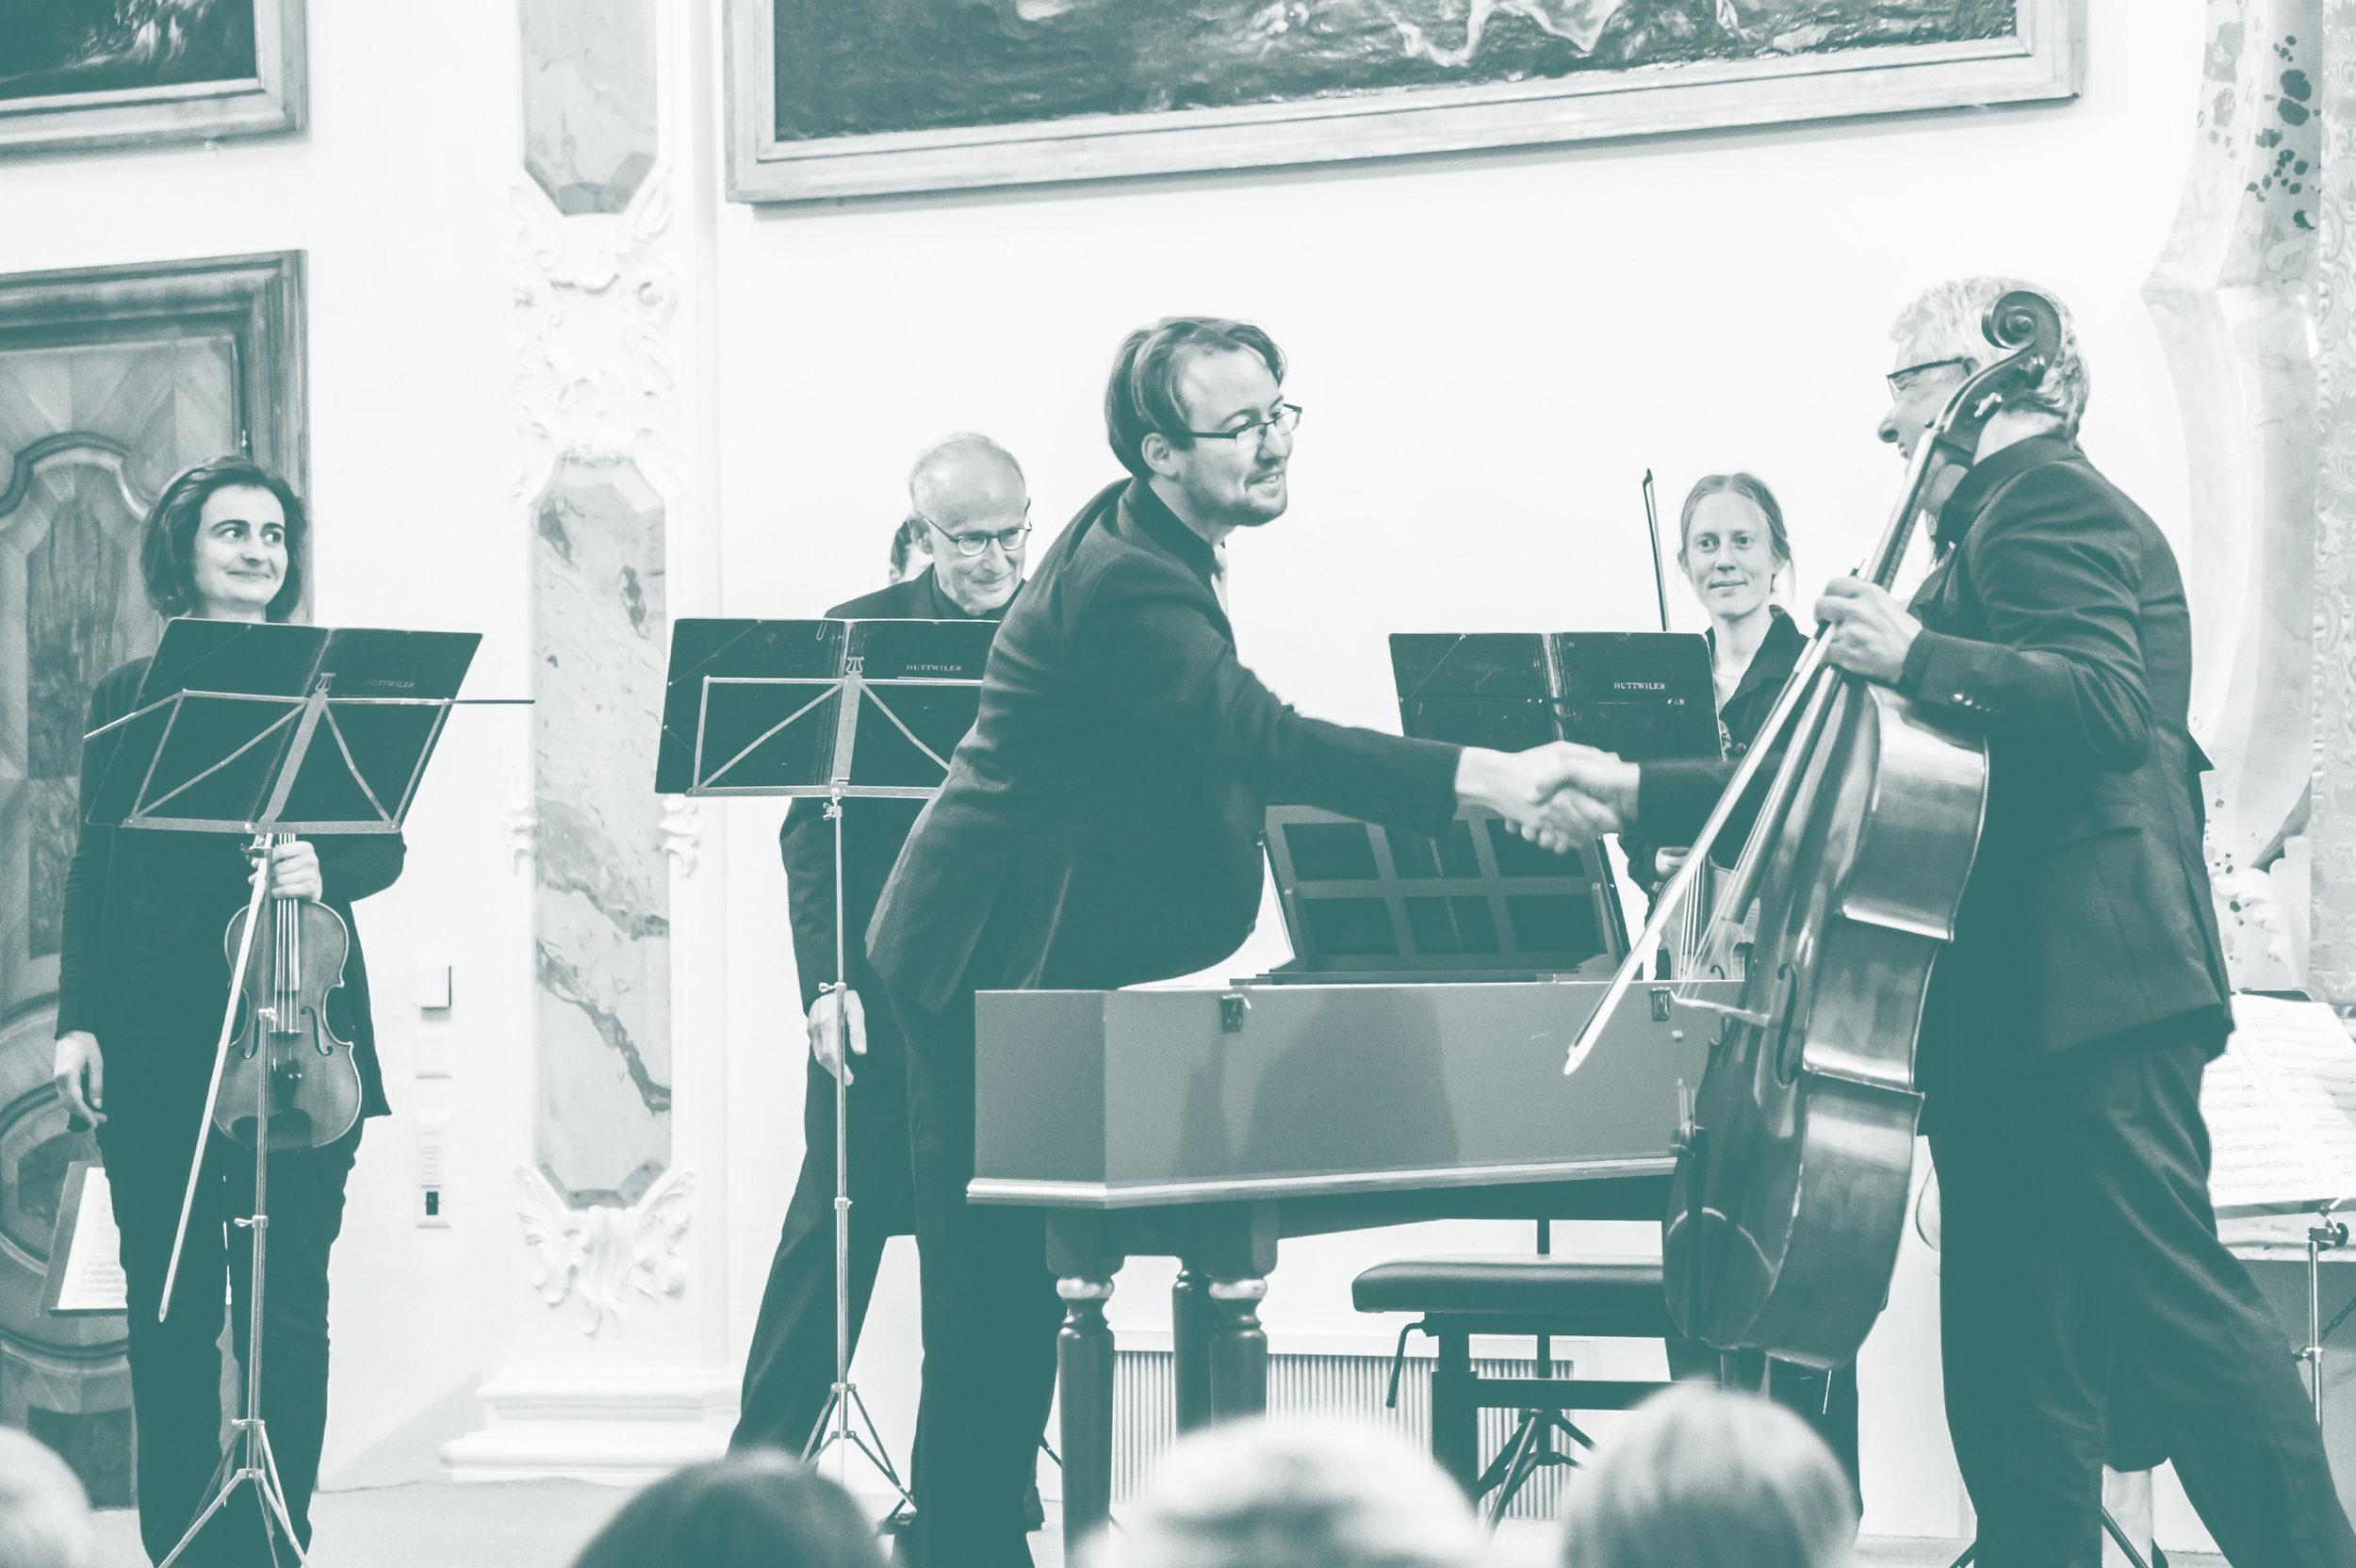 17_09_Herbstkonzert Kammerorchester Huttwil_BO-67_sw.jpg